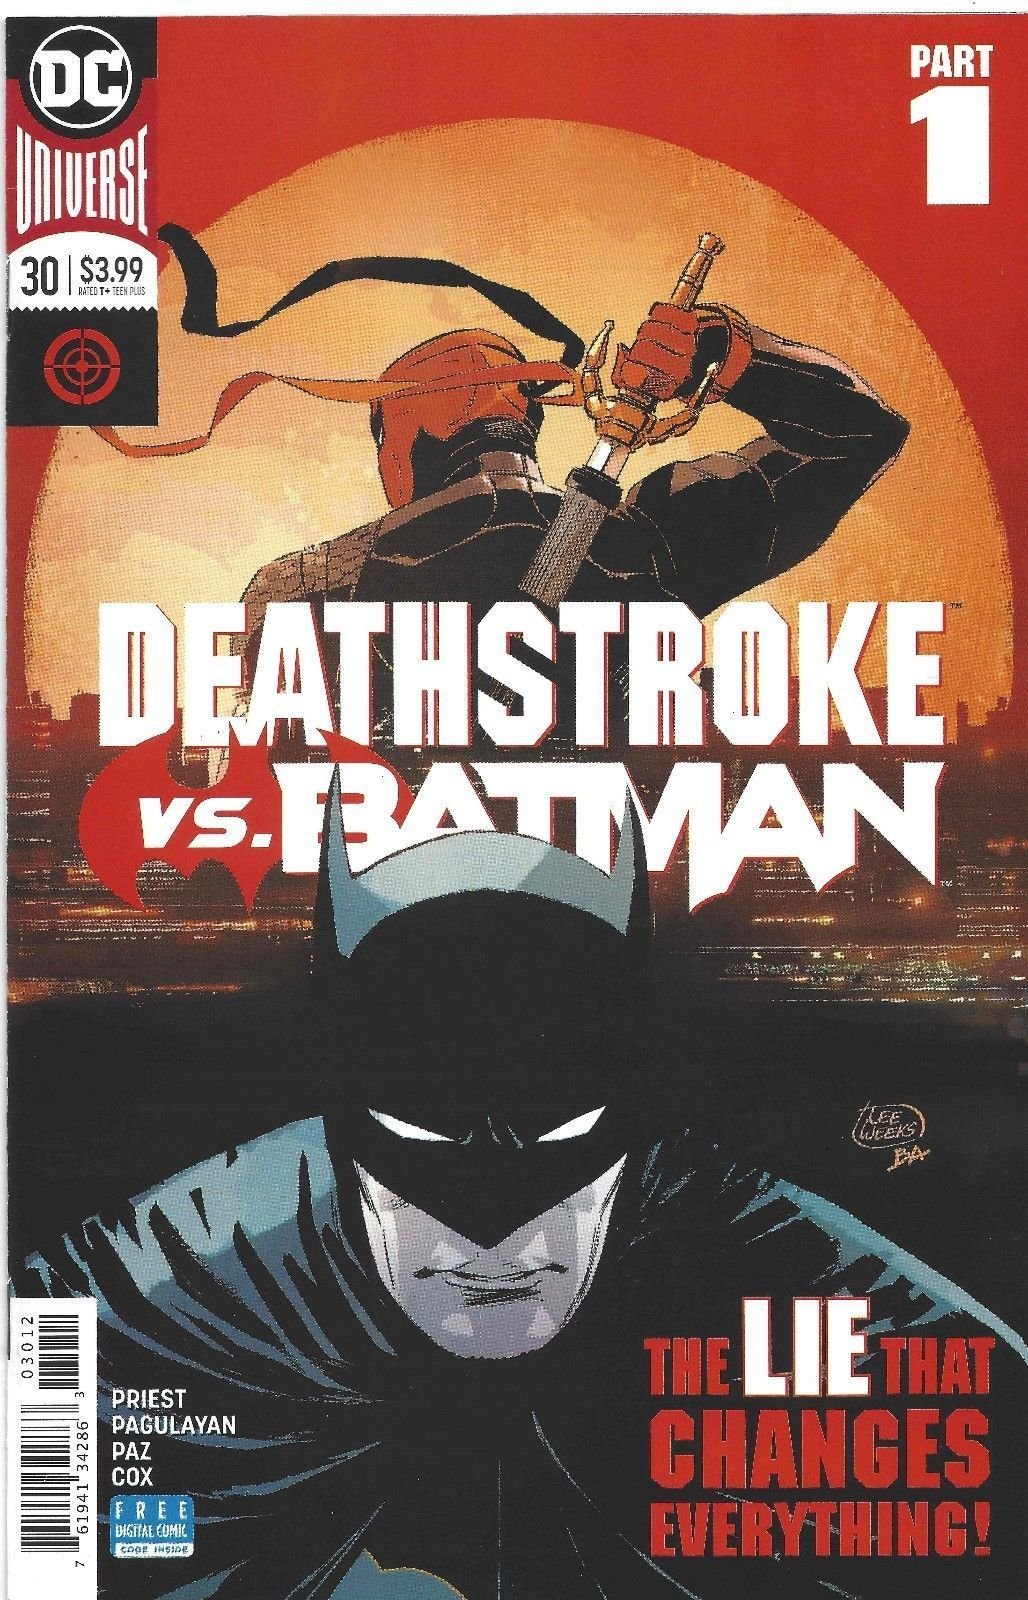 Deathstroke #30 2nd Print PDF